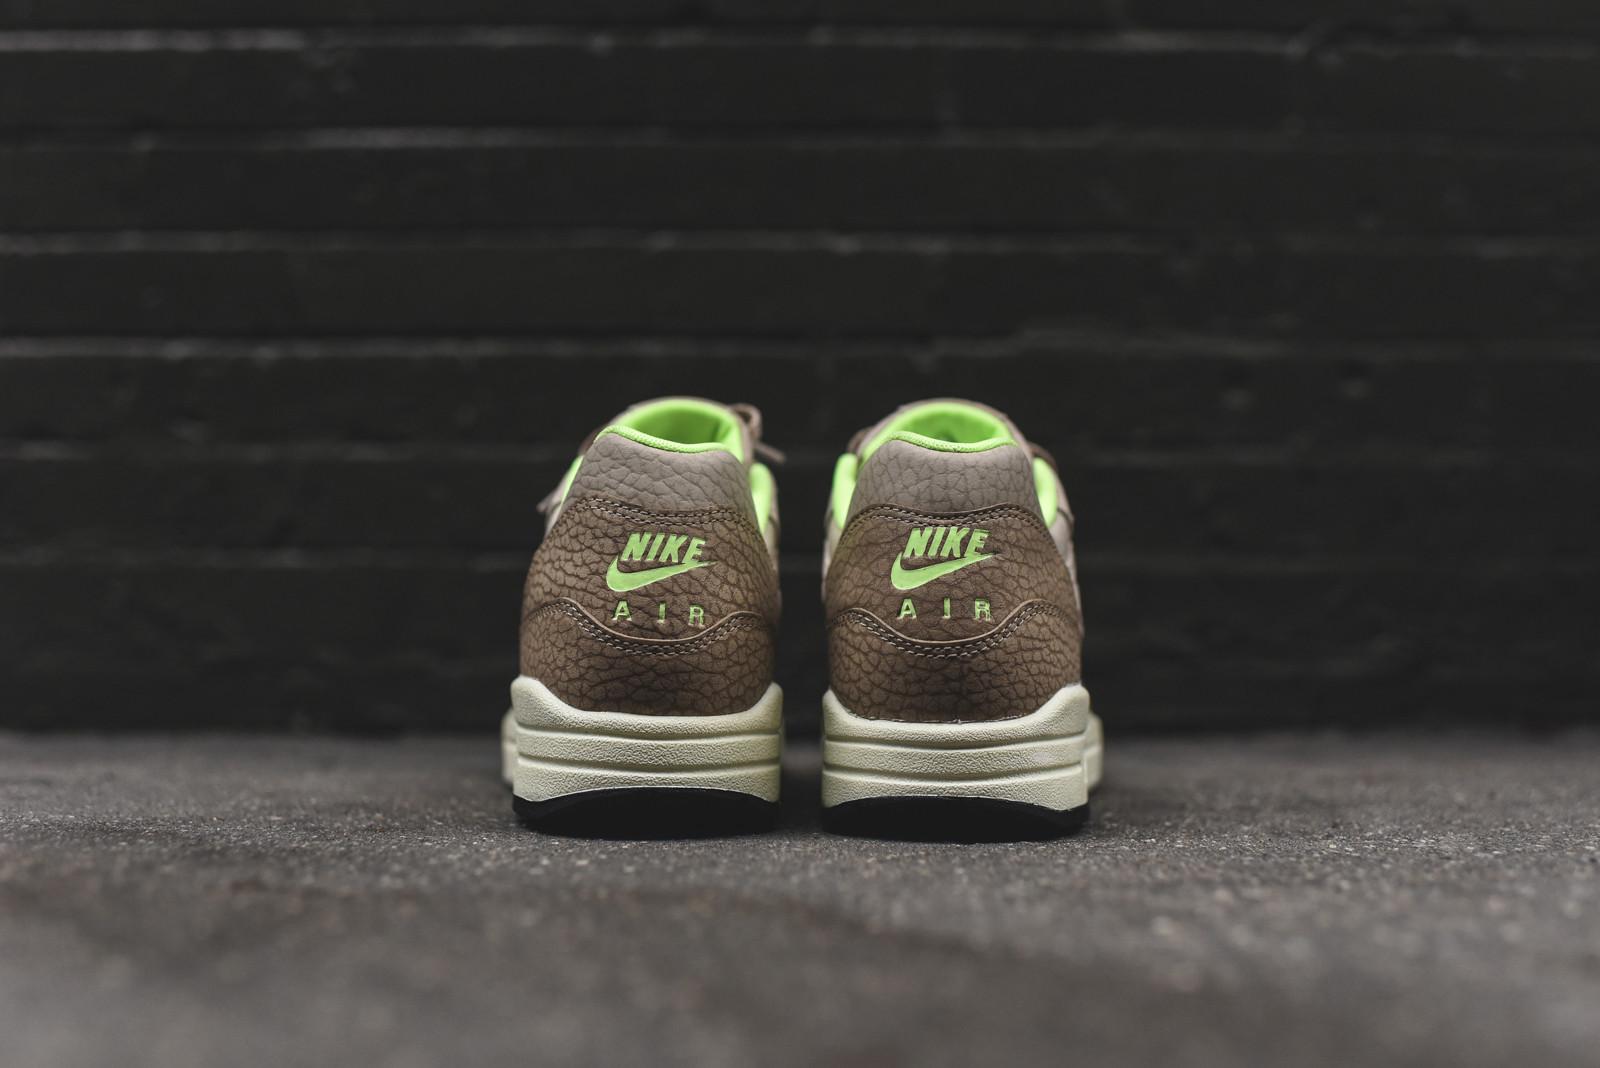 Nike_Air_Max_1_PRM_-String_String-DSRT_CM-GHST_GRN_512033_203_5